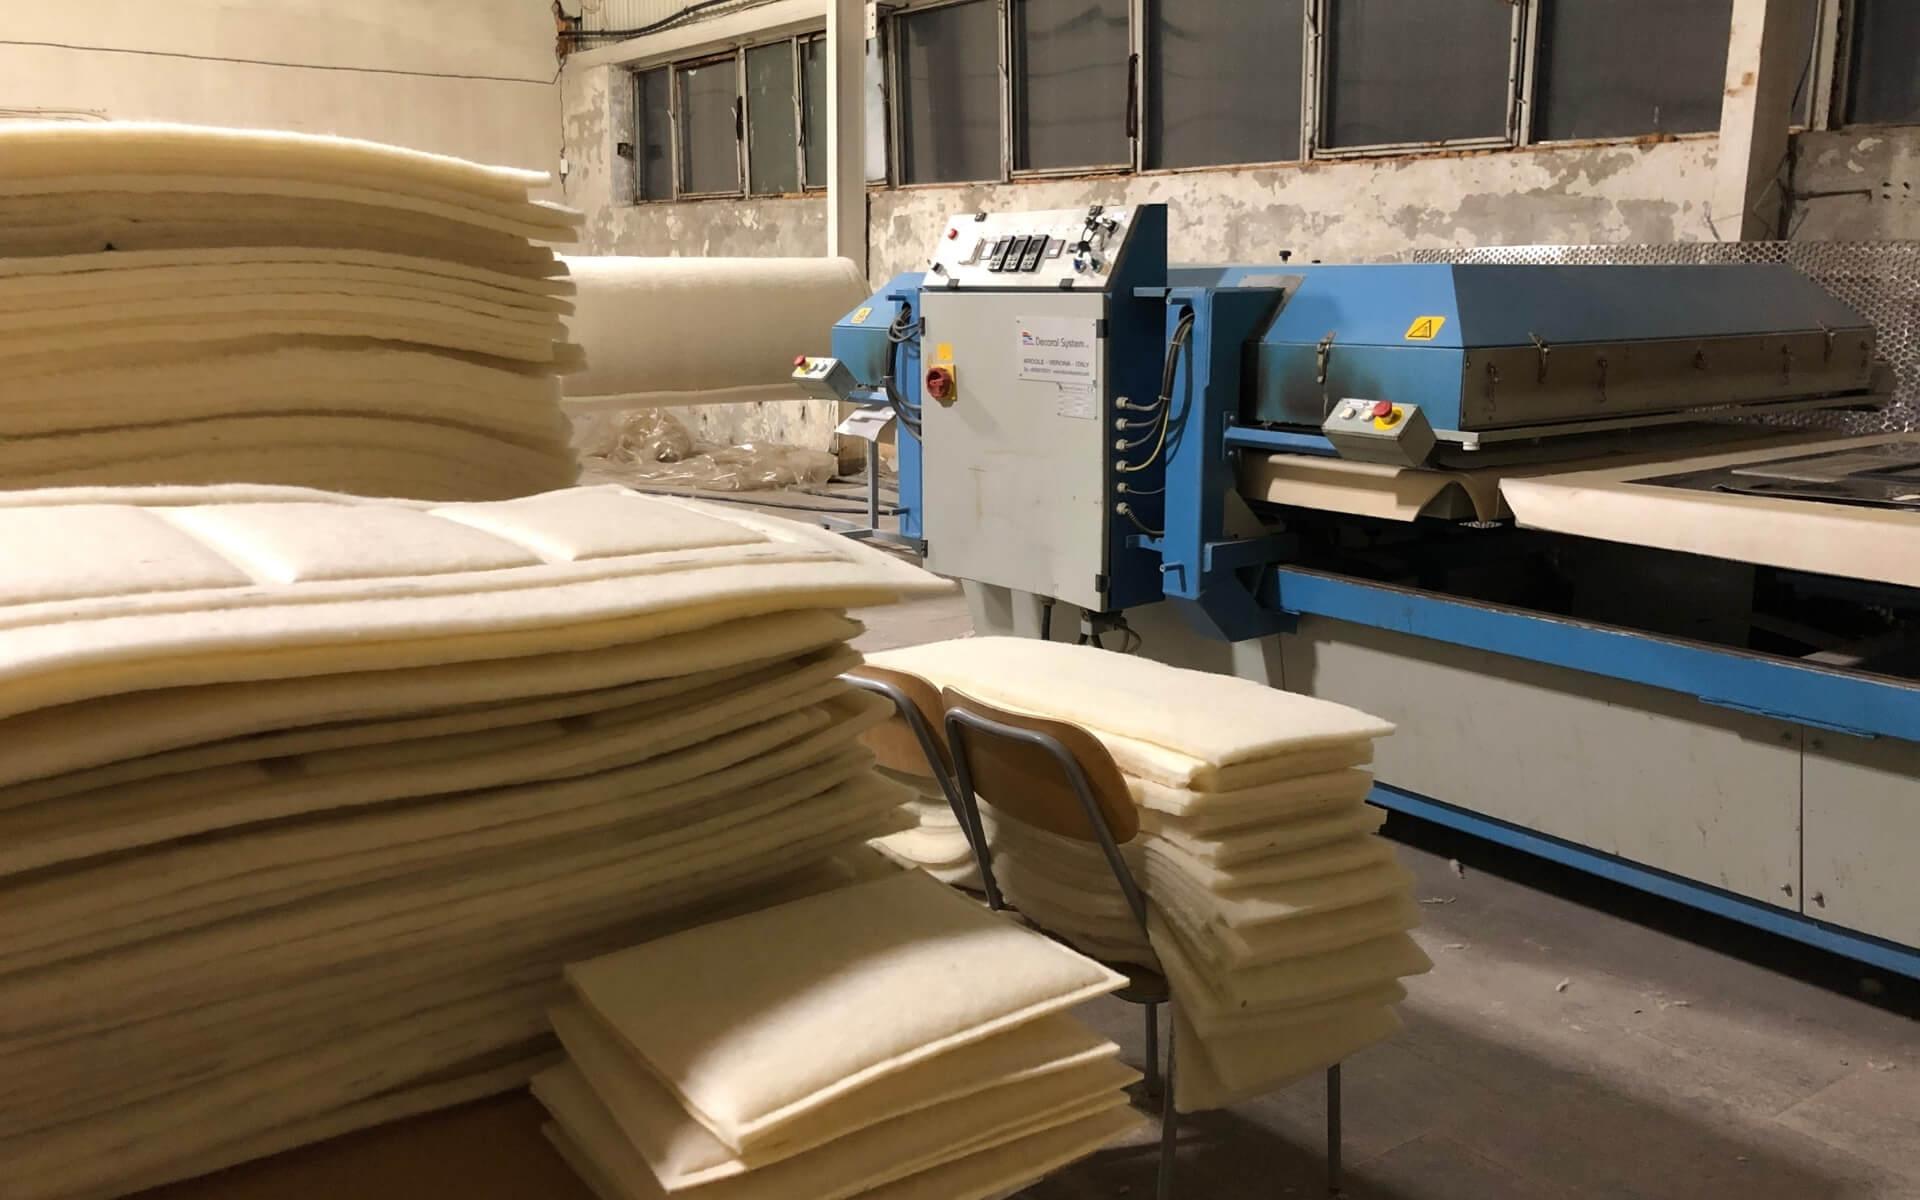 Katrin Kabun Villaümbrik - Woola tootmine Paldiski tehases